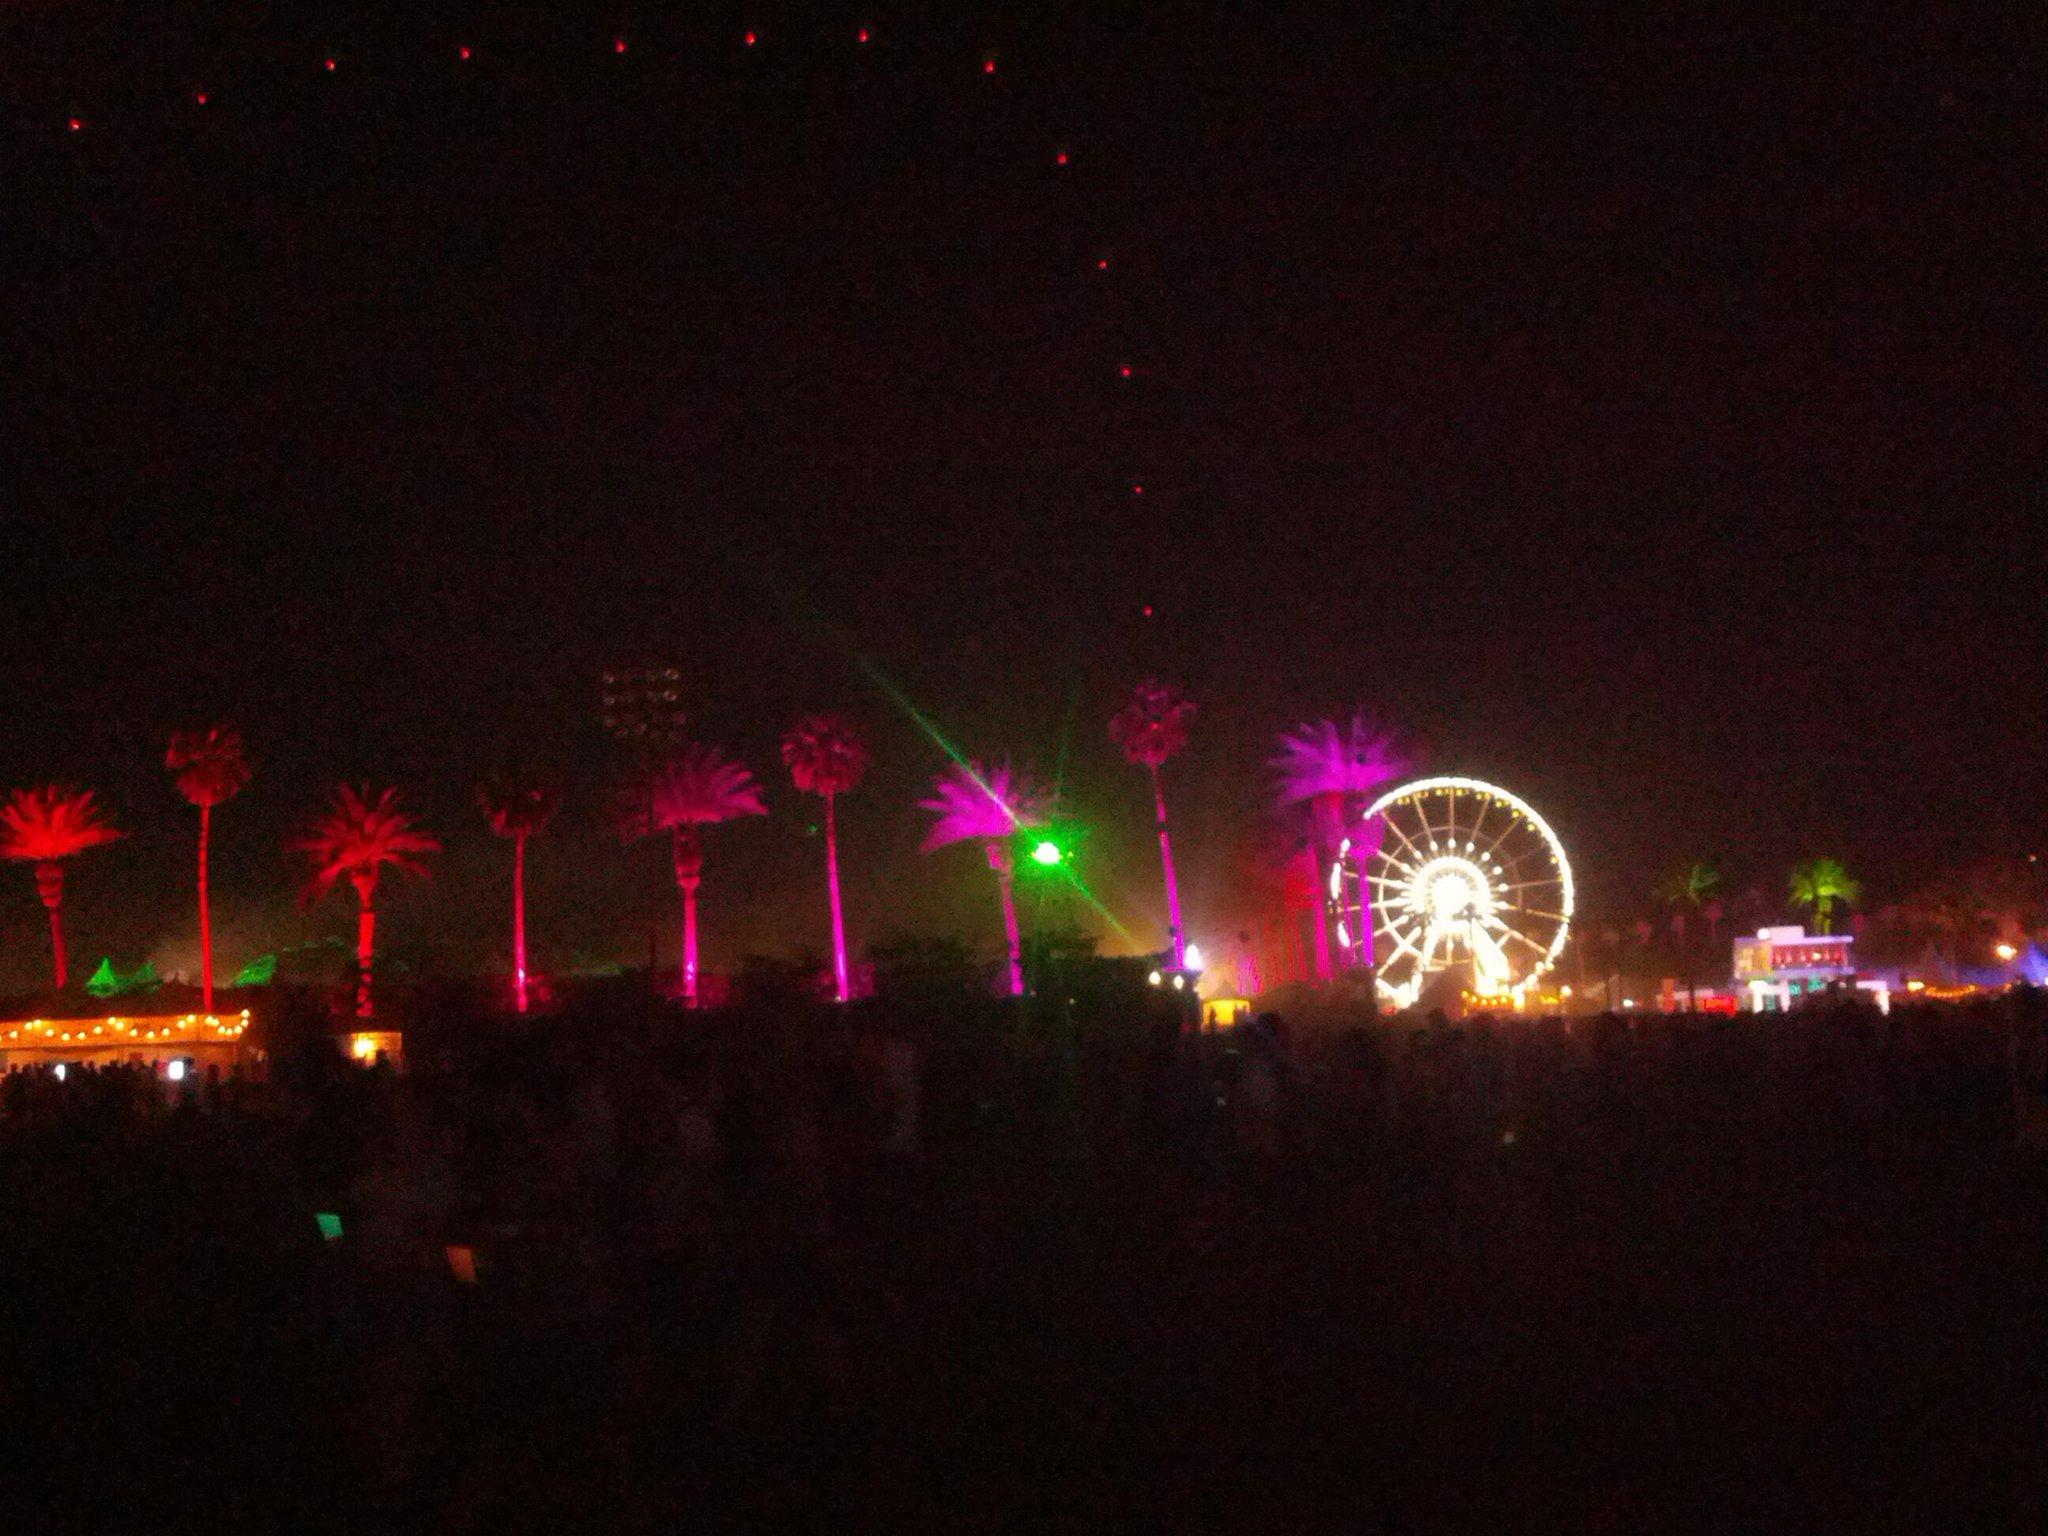 The Faris Wheel at night #SaveFarisFest @savefaris http://t.co/Te2PdPkMLN